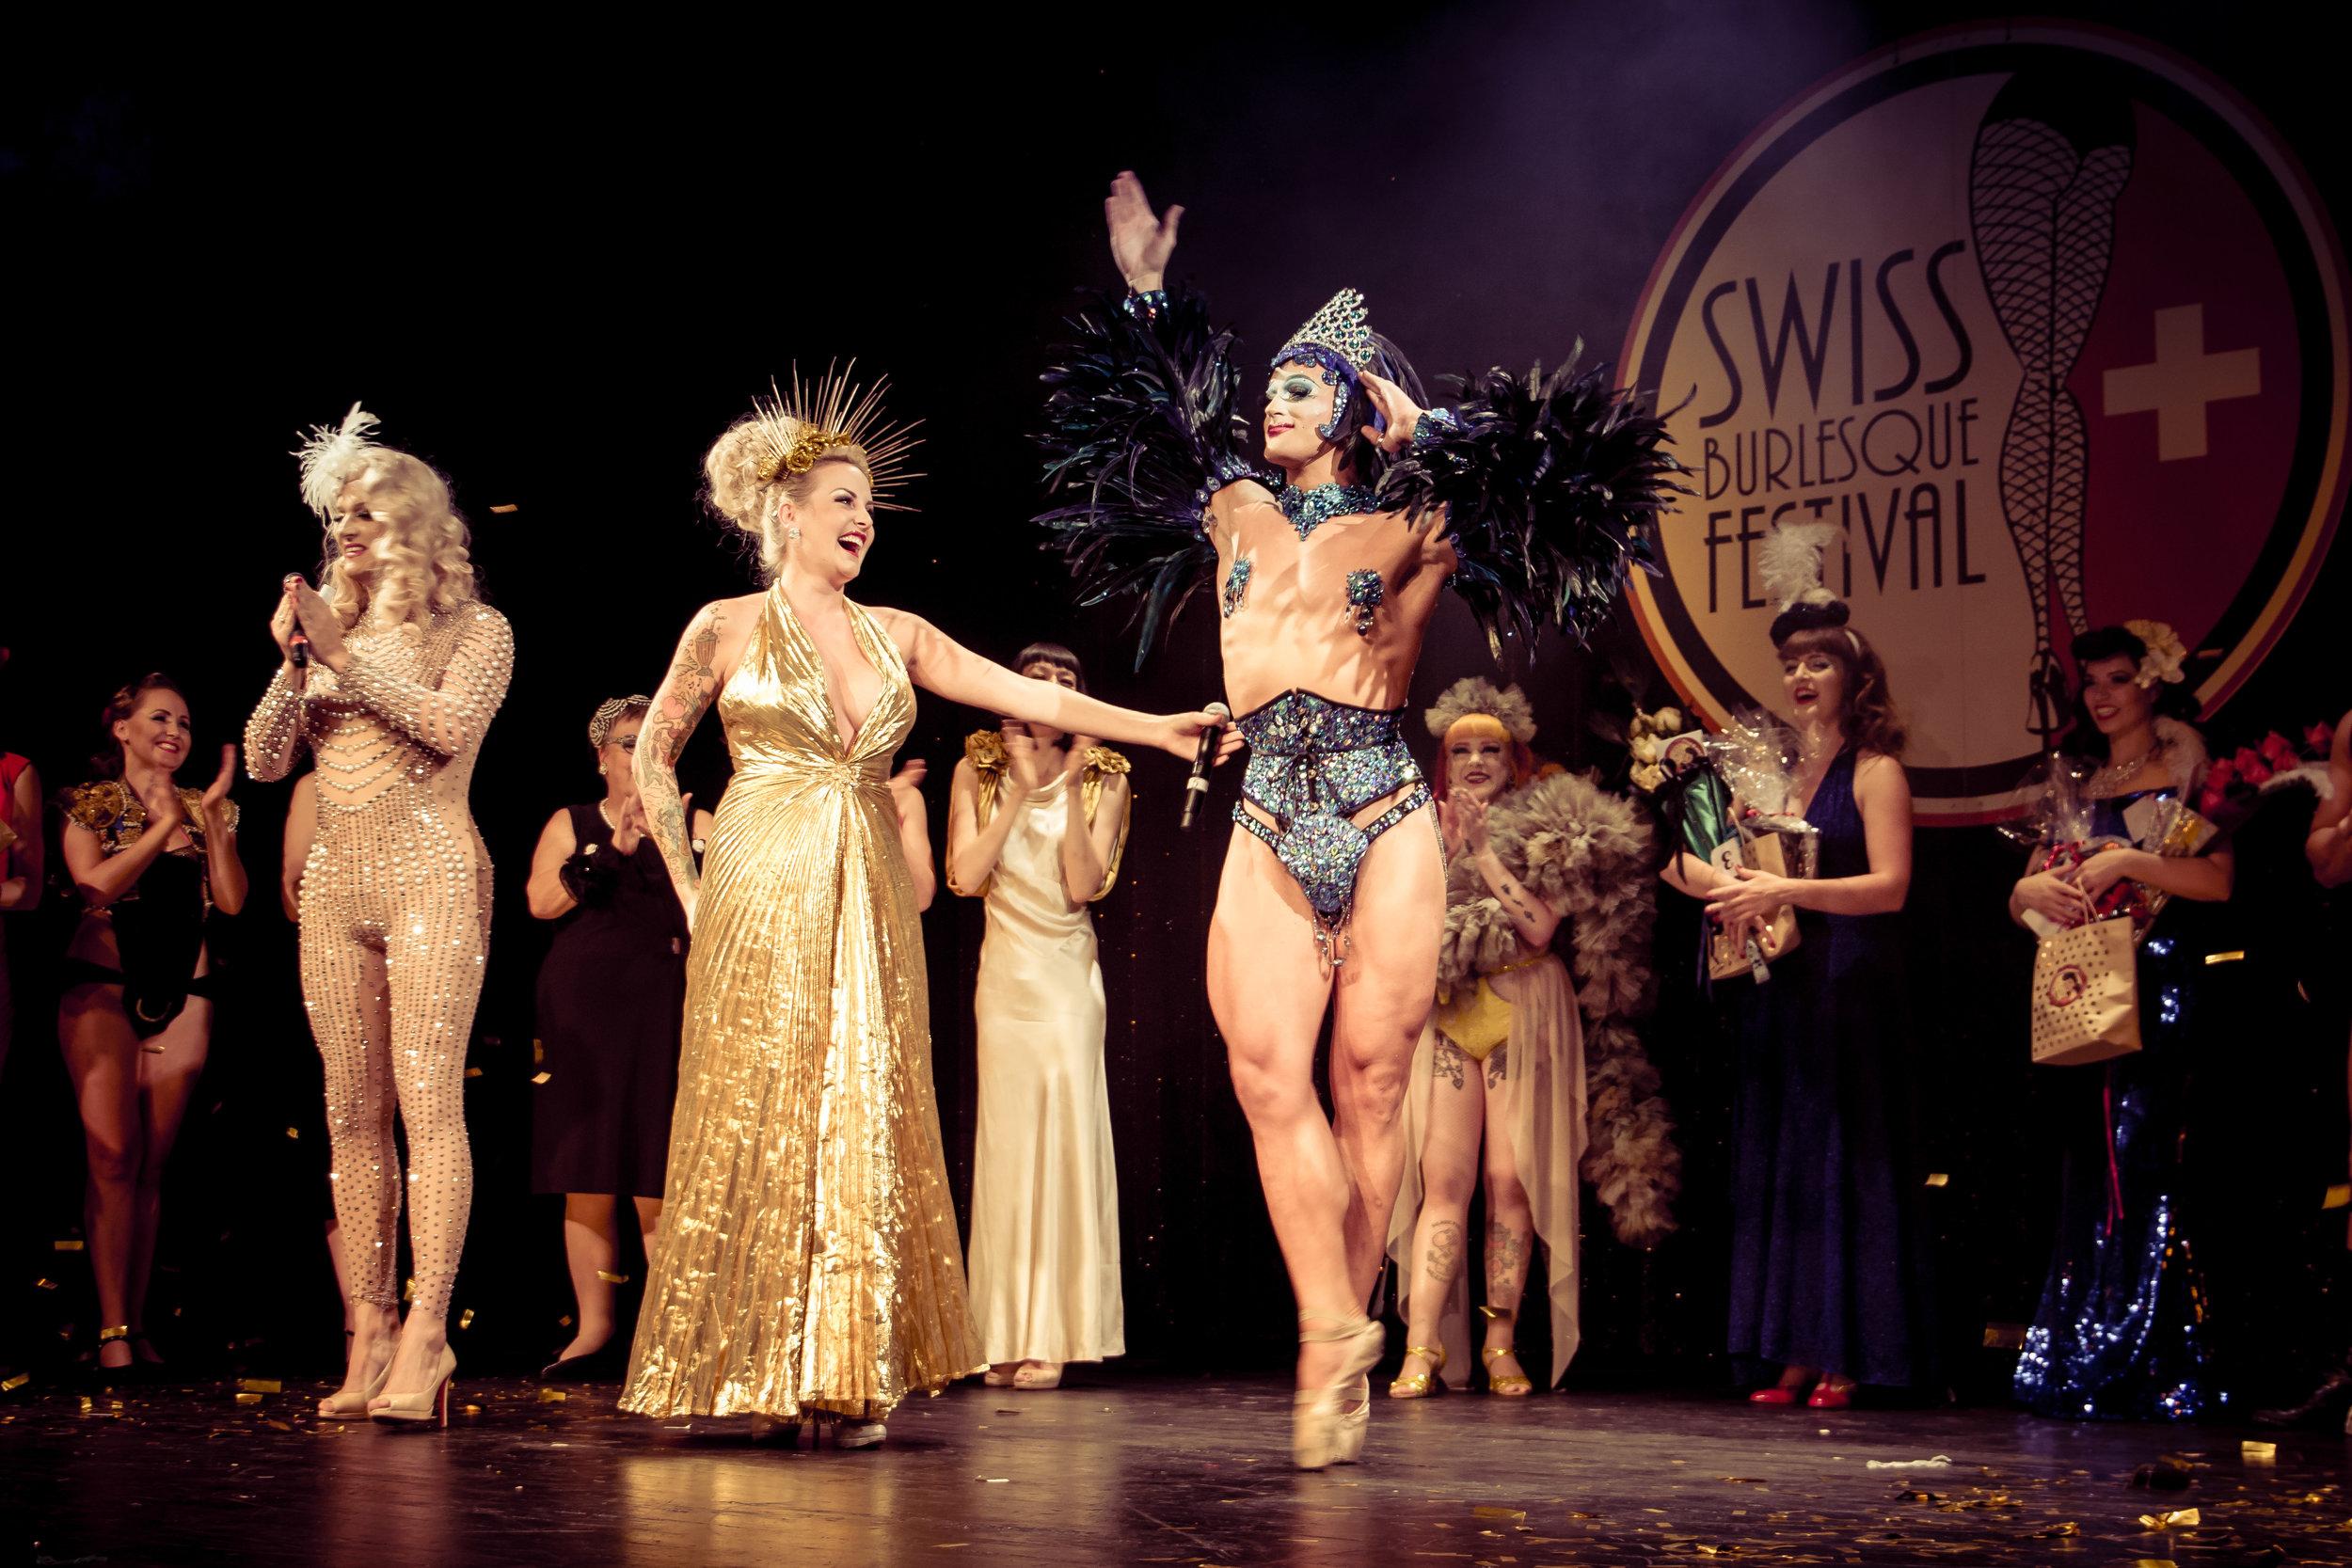 Swiss Burlesque Festival 2018 by Dirk Behlau-4225.jpg